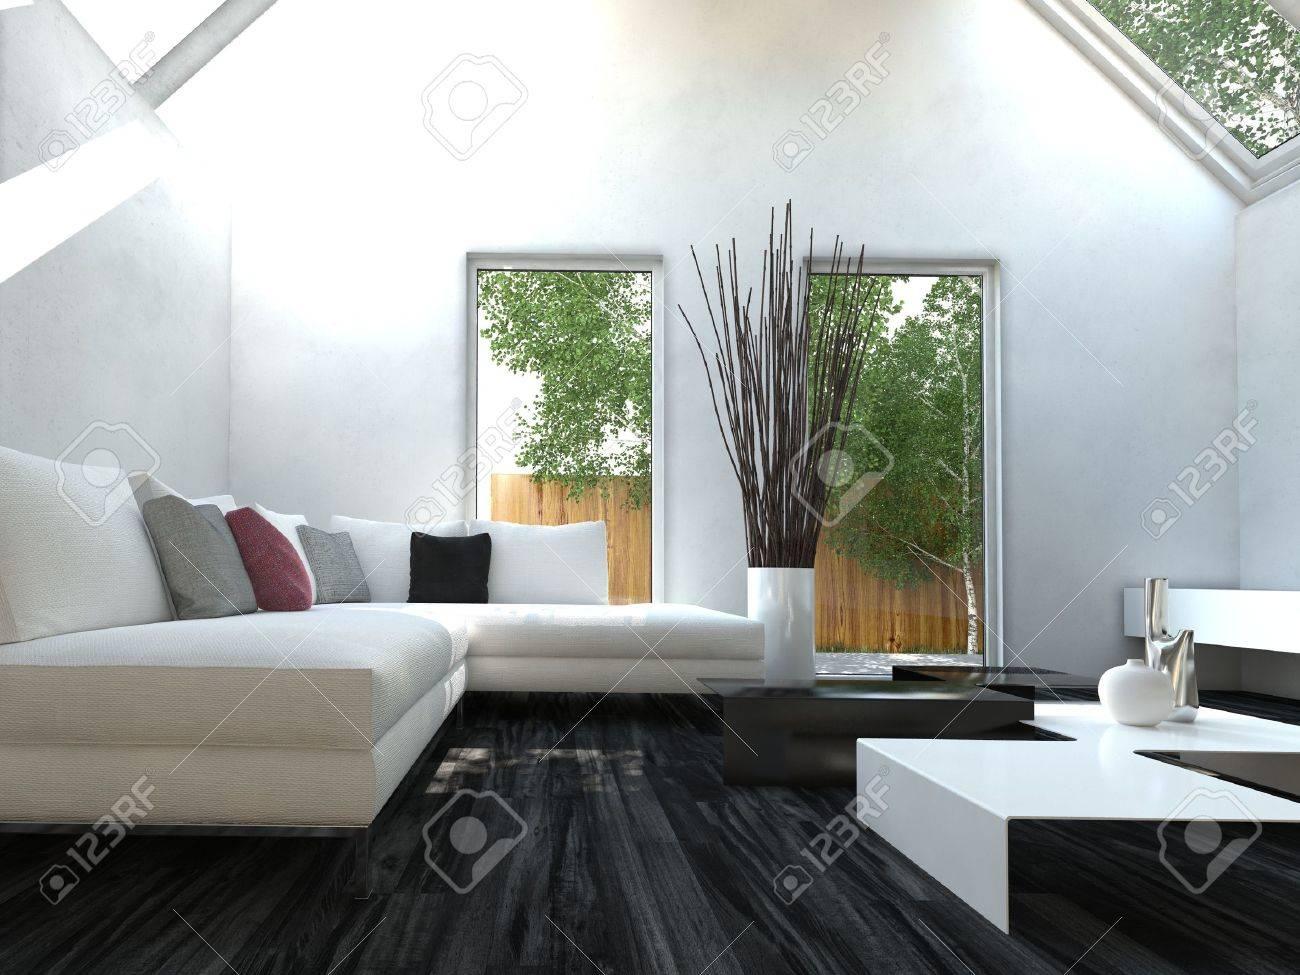 Moderne Zwart-wit Ontwerp Stijl Woonkamer Interieur Met Mooie ...